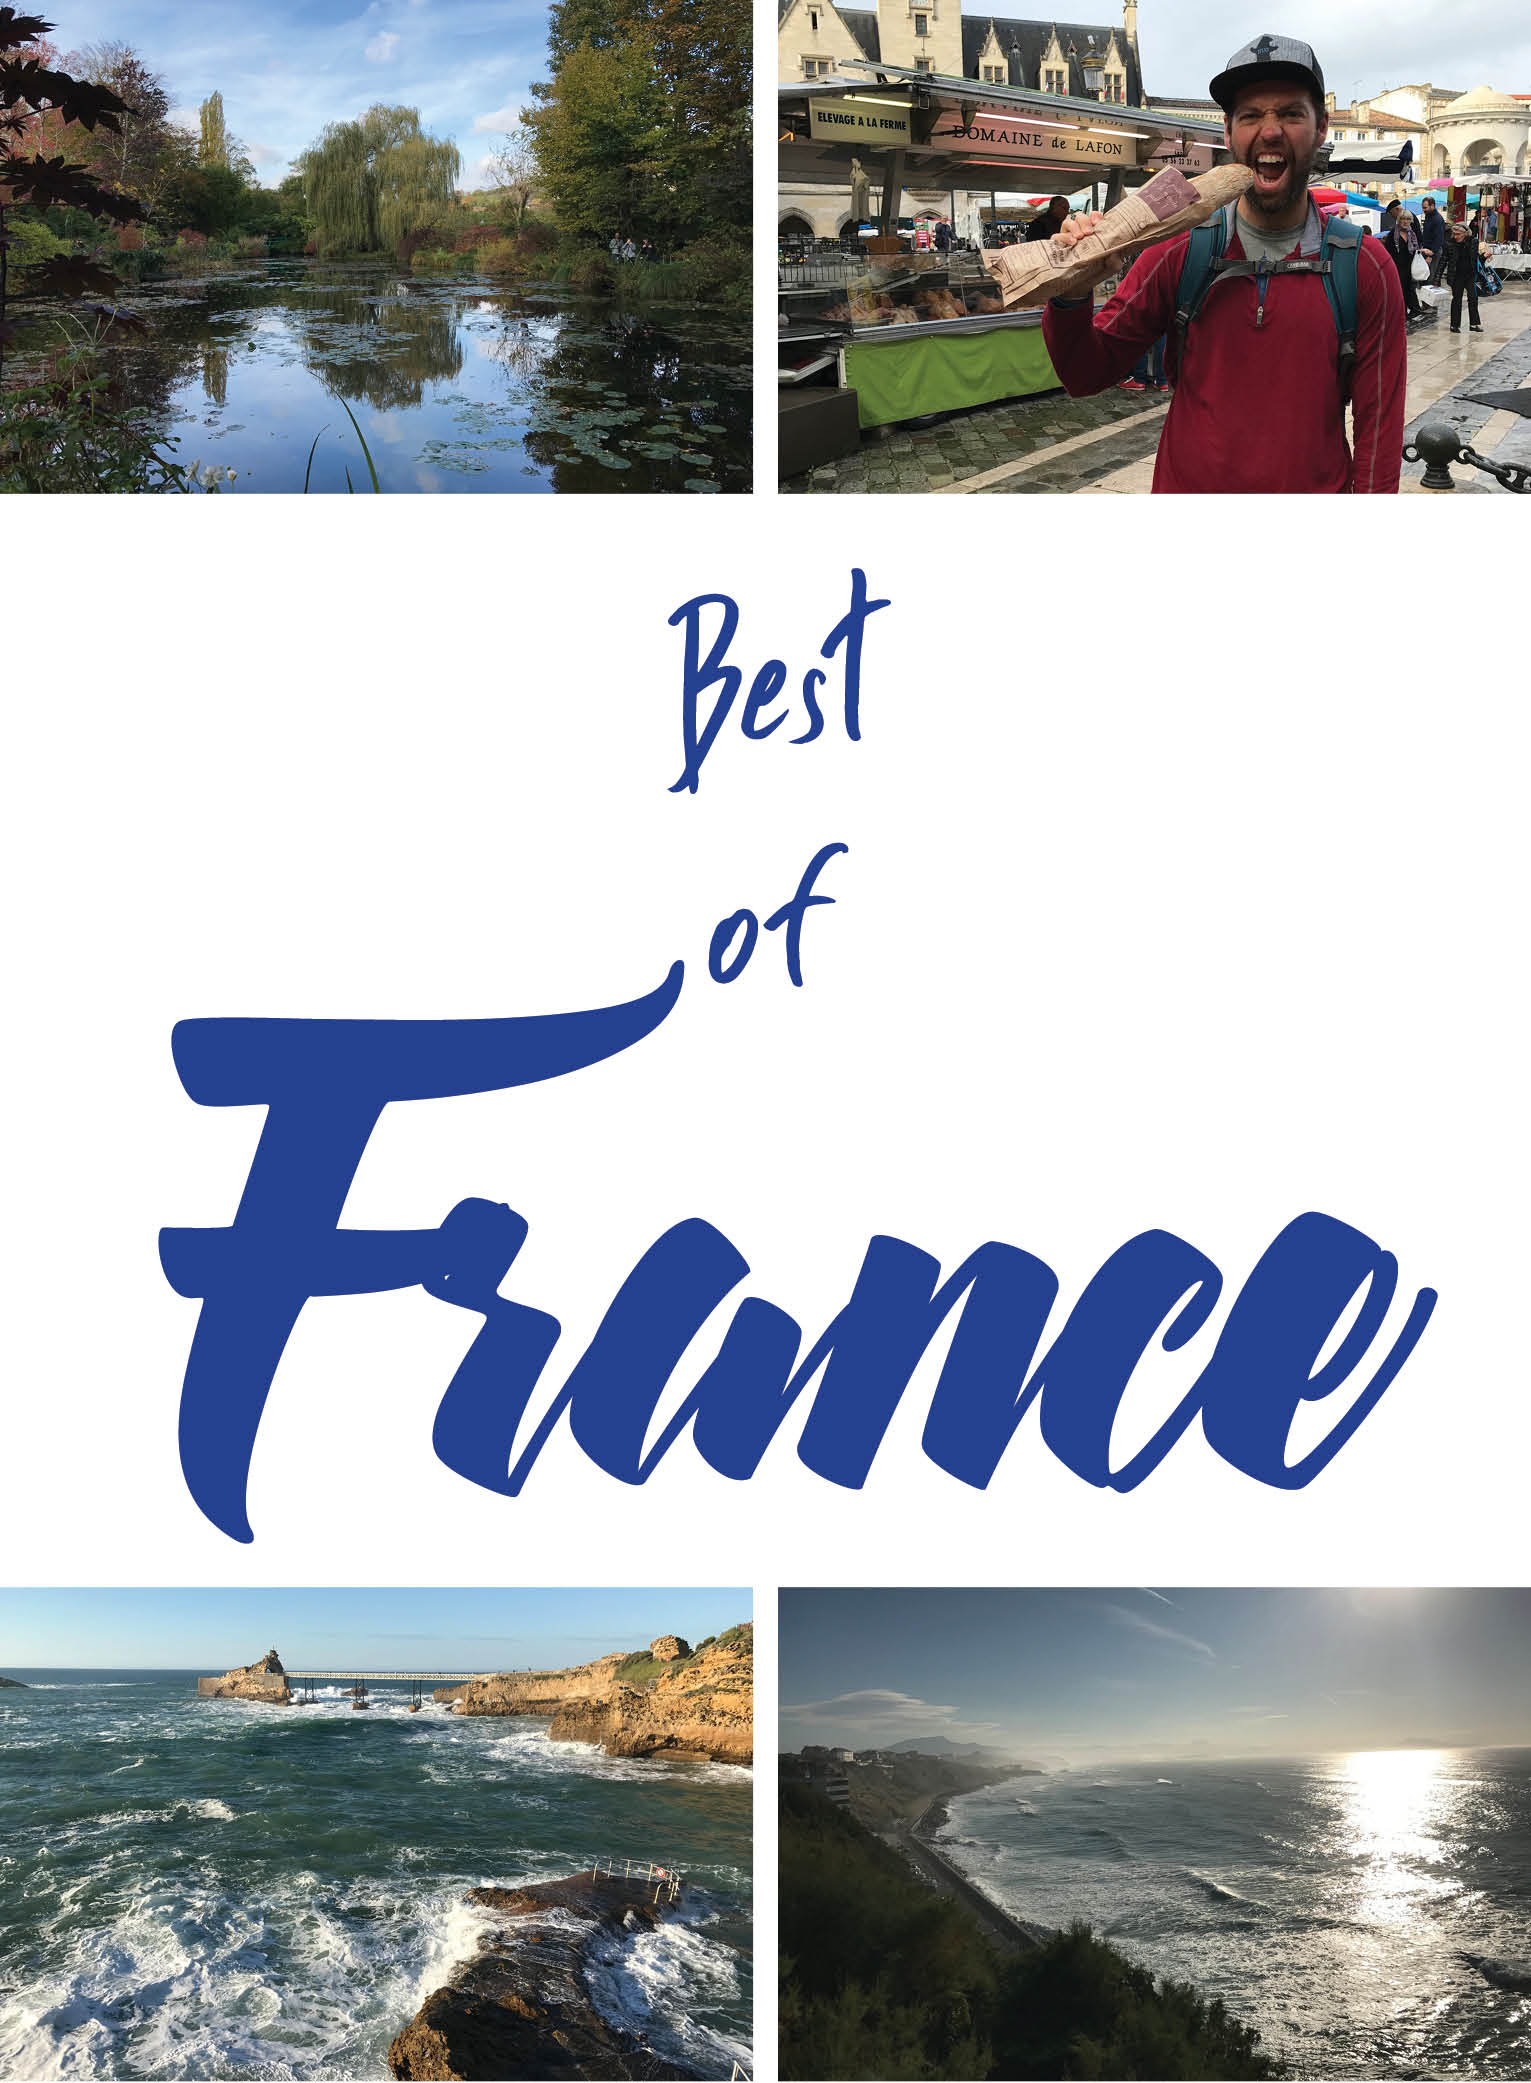 Best of France_collage.jpg